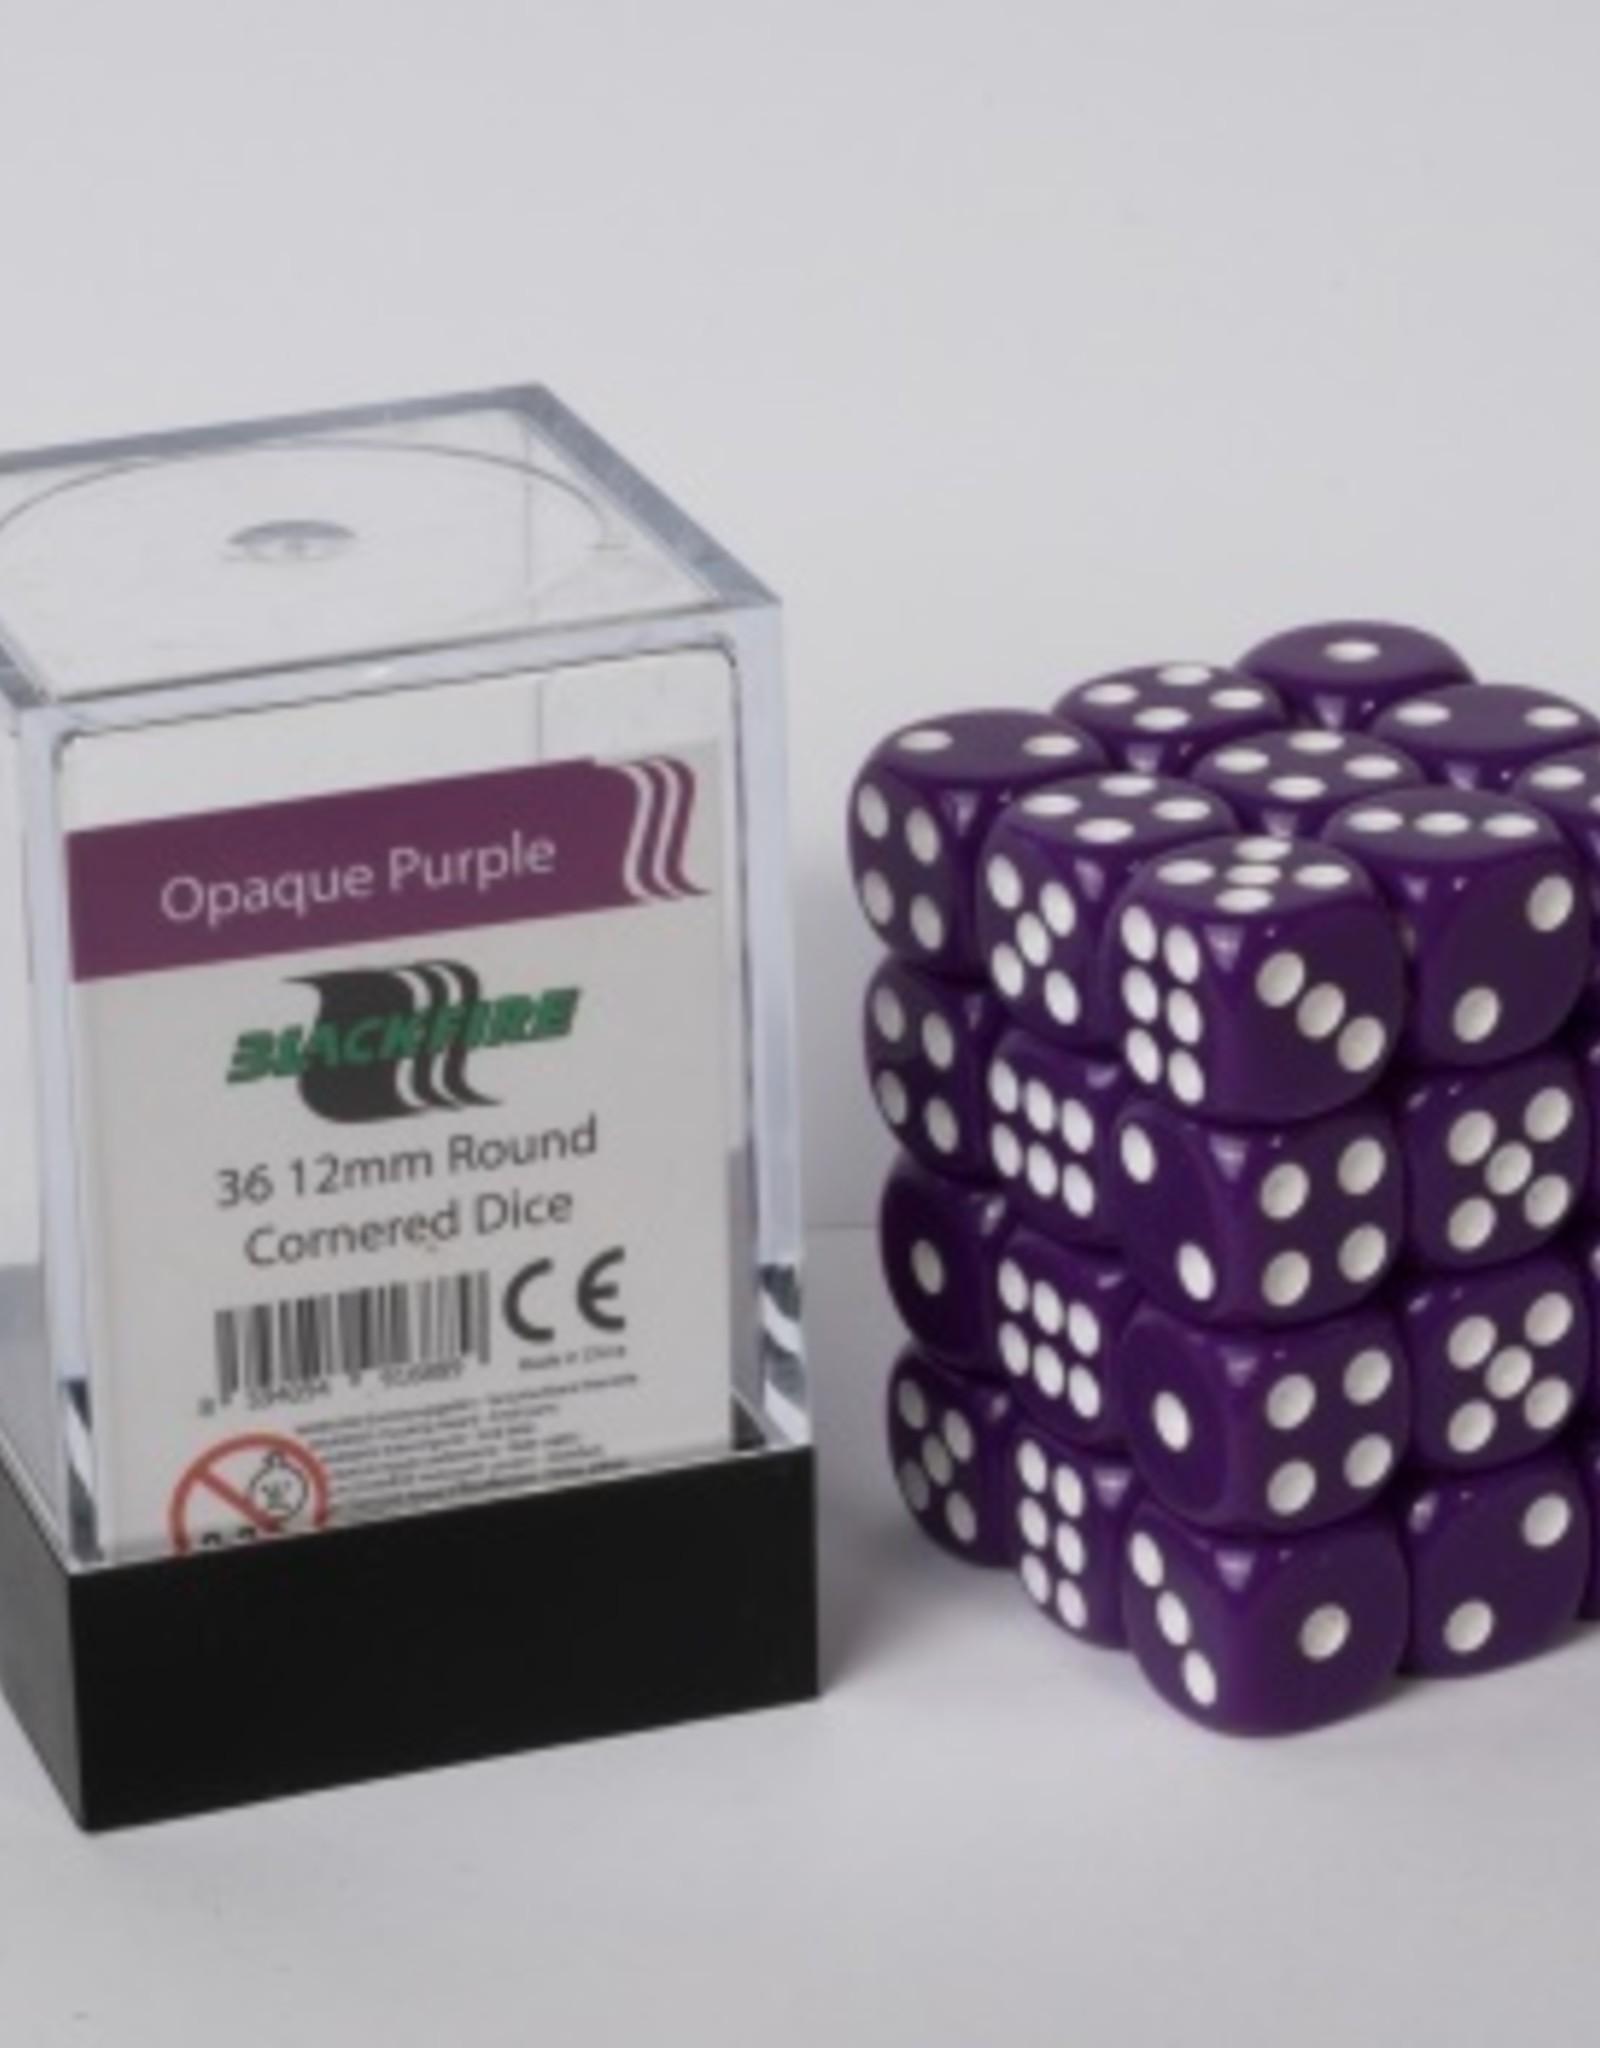 ADC Blackfire Dice cube 12mm - Opaque Purple (36)